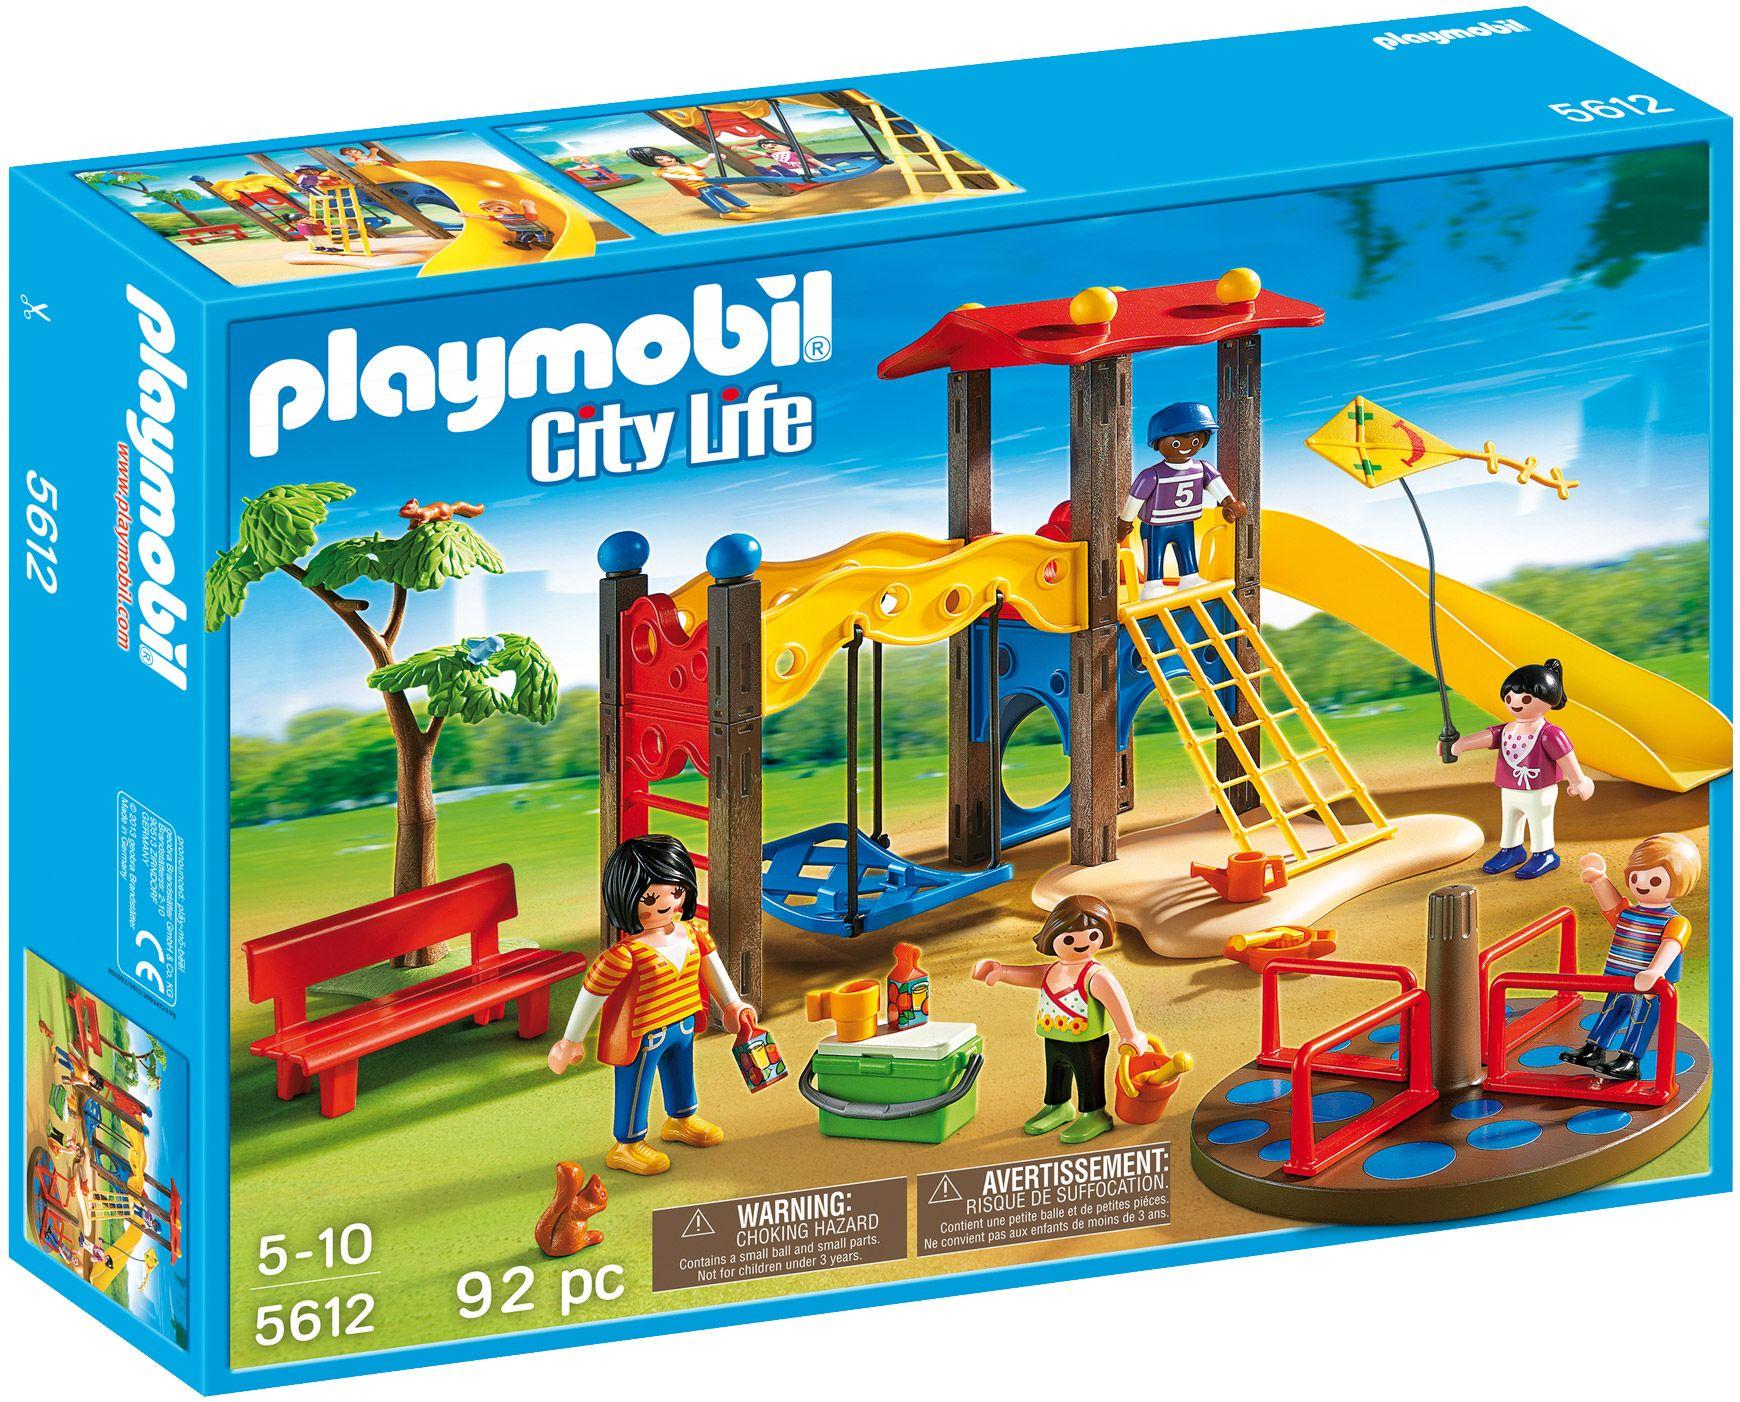 Epingle Sur Playmobil City Life